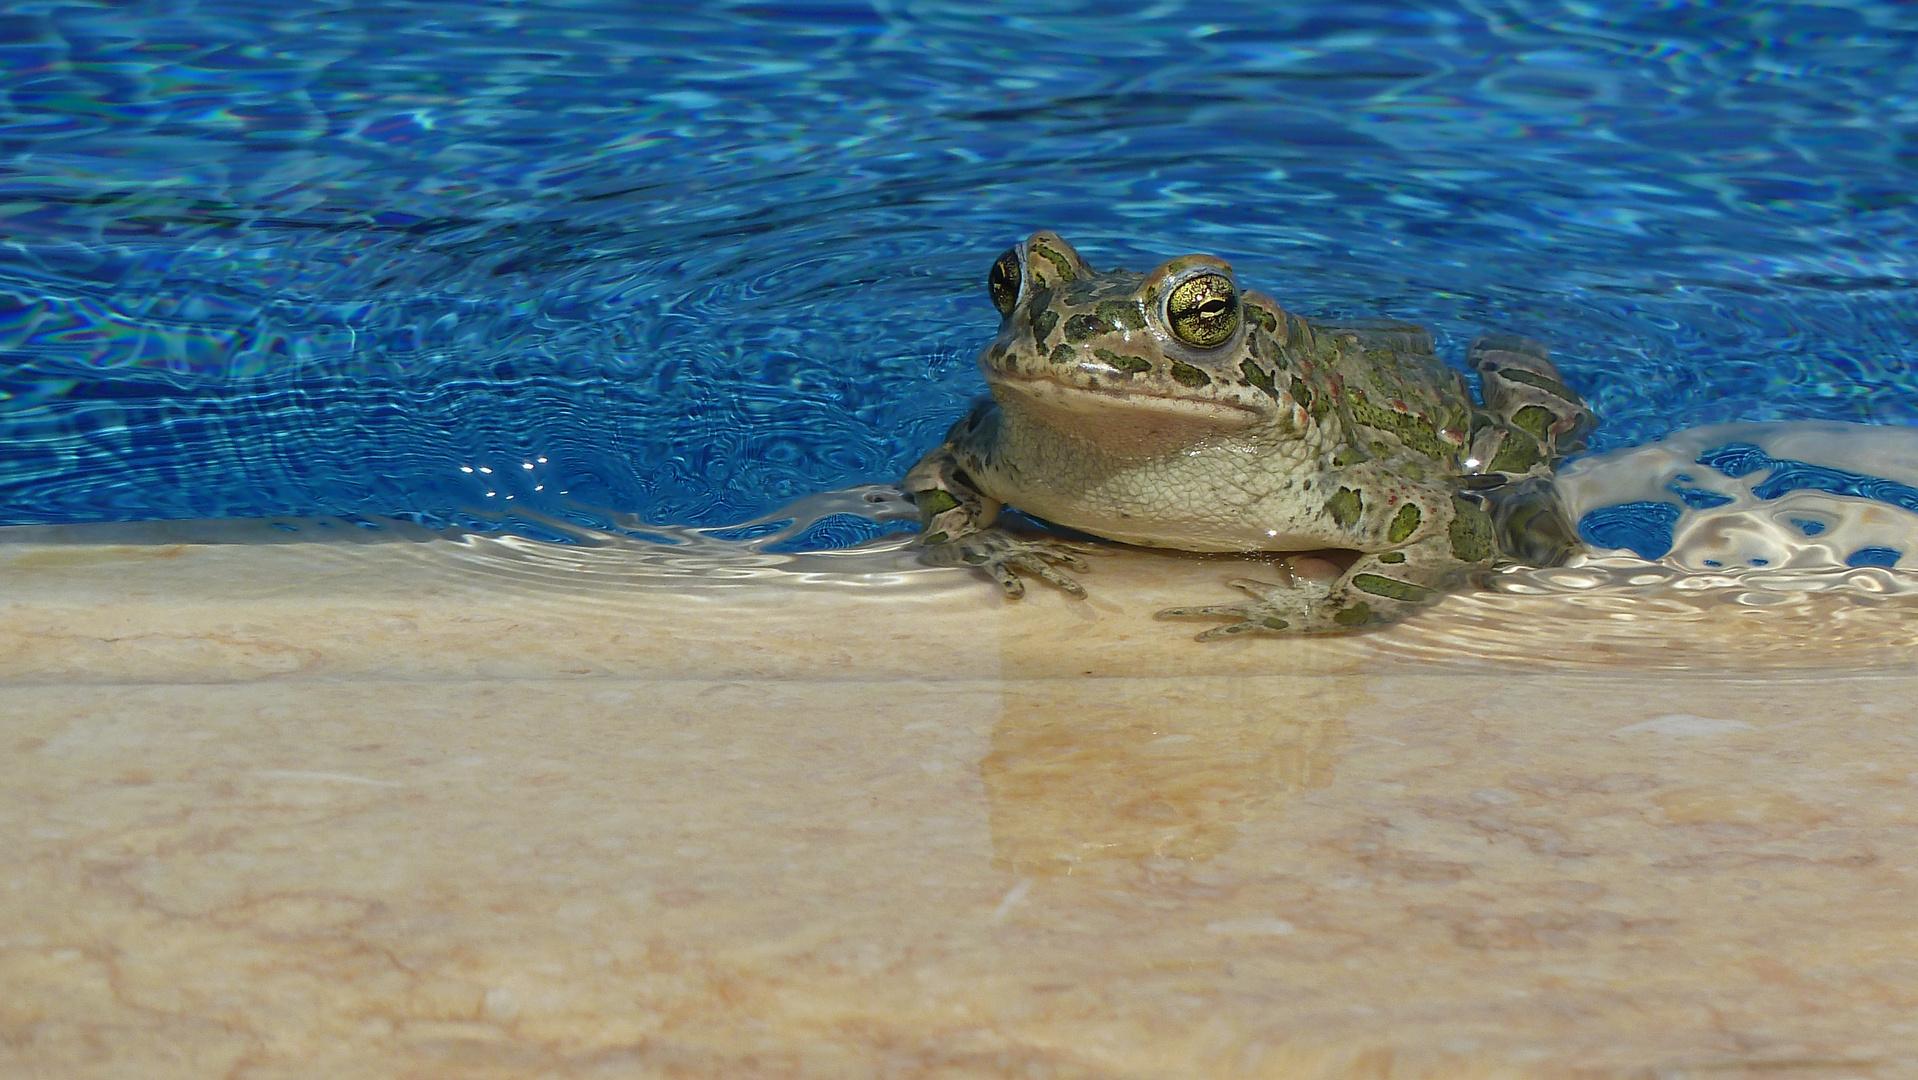 Pool-Frosch